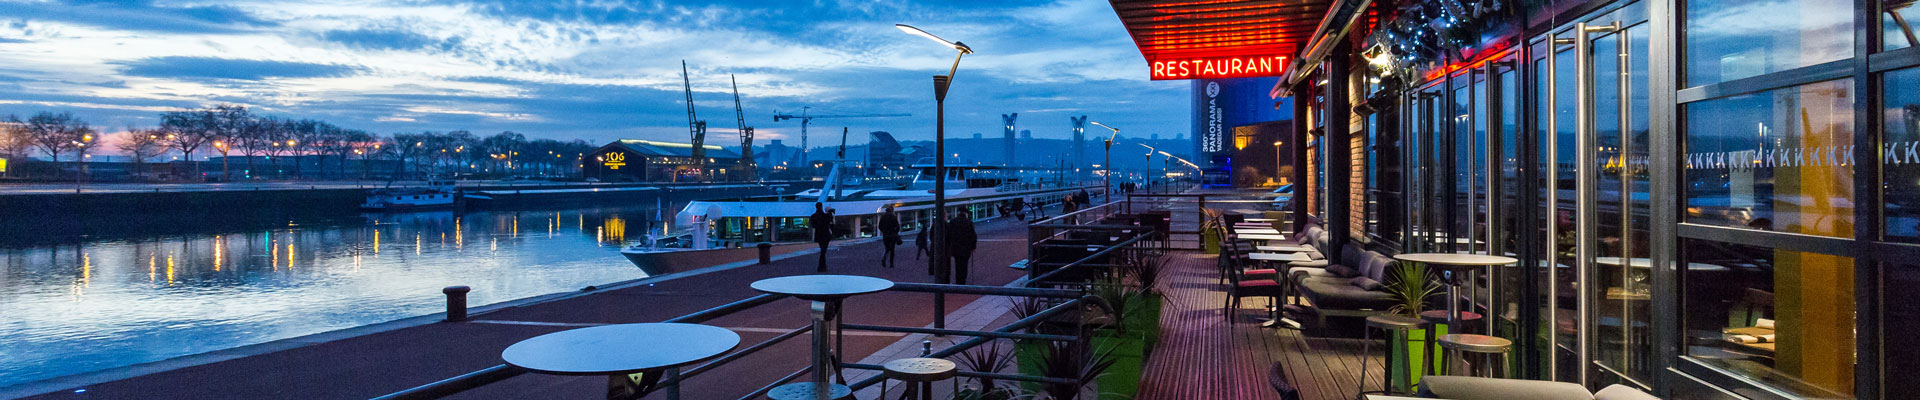 la-fabrik-steakhouse-food-&-drink-restaurant-bar-hangar-quai-rouen-seine-53-bandeau-terrasse-1920×400